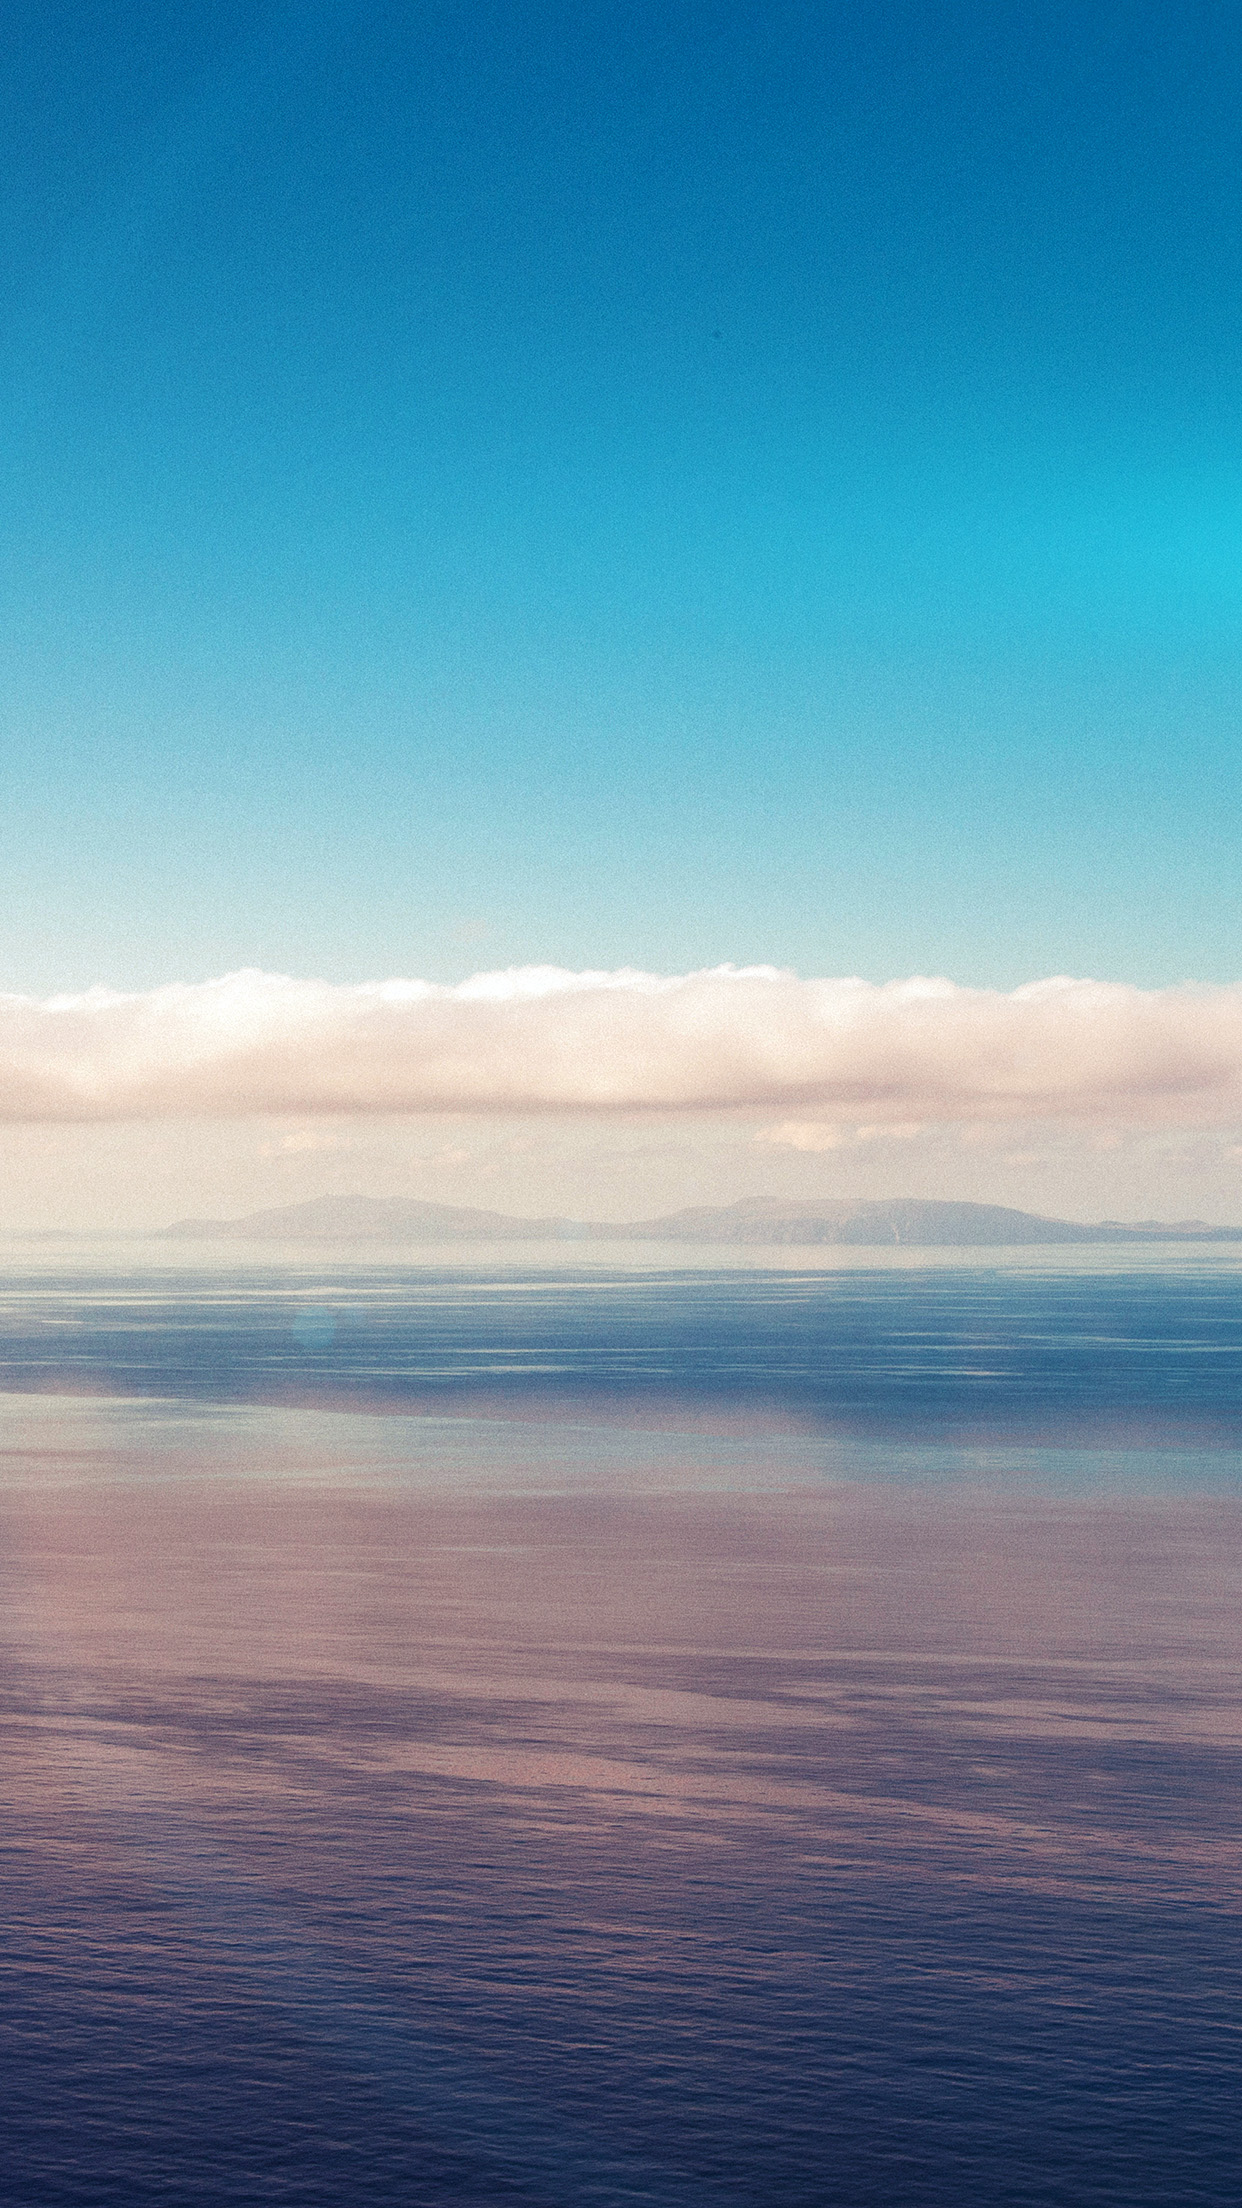 Iphonexpapers Com Iphone X Wallpaper Mt27 Blue Sky Nature Ocean View Flare